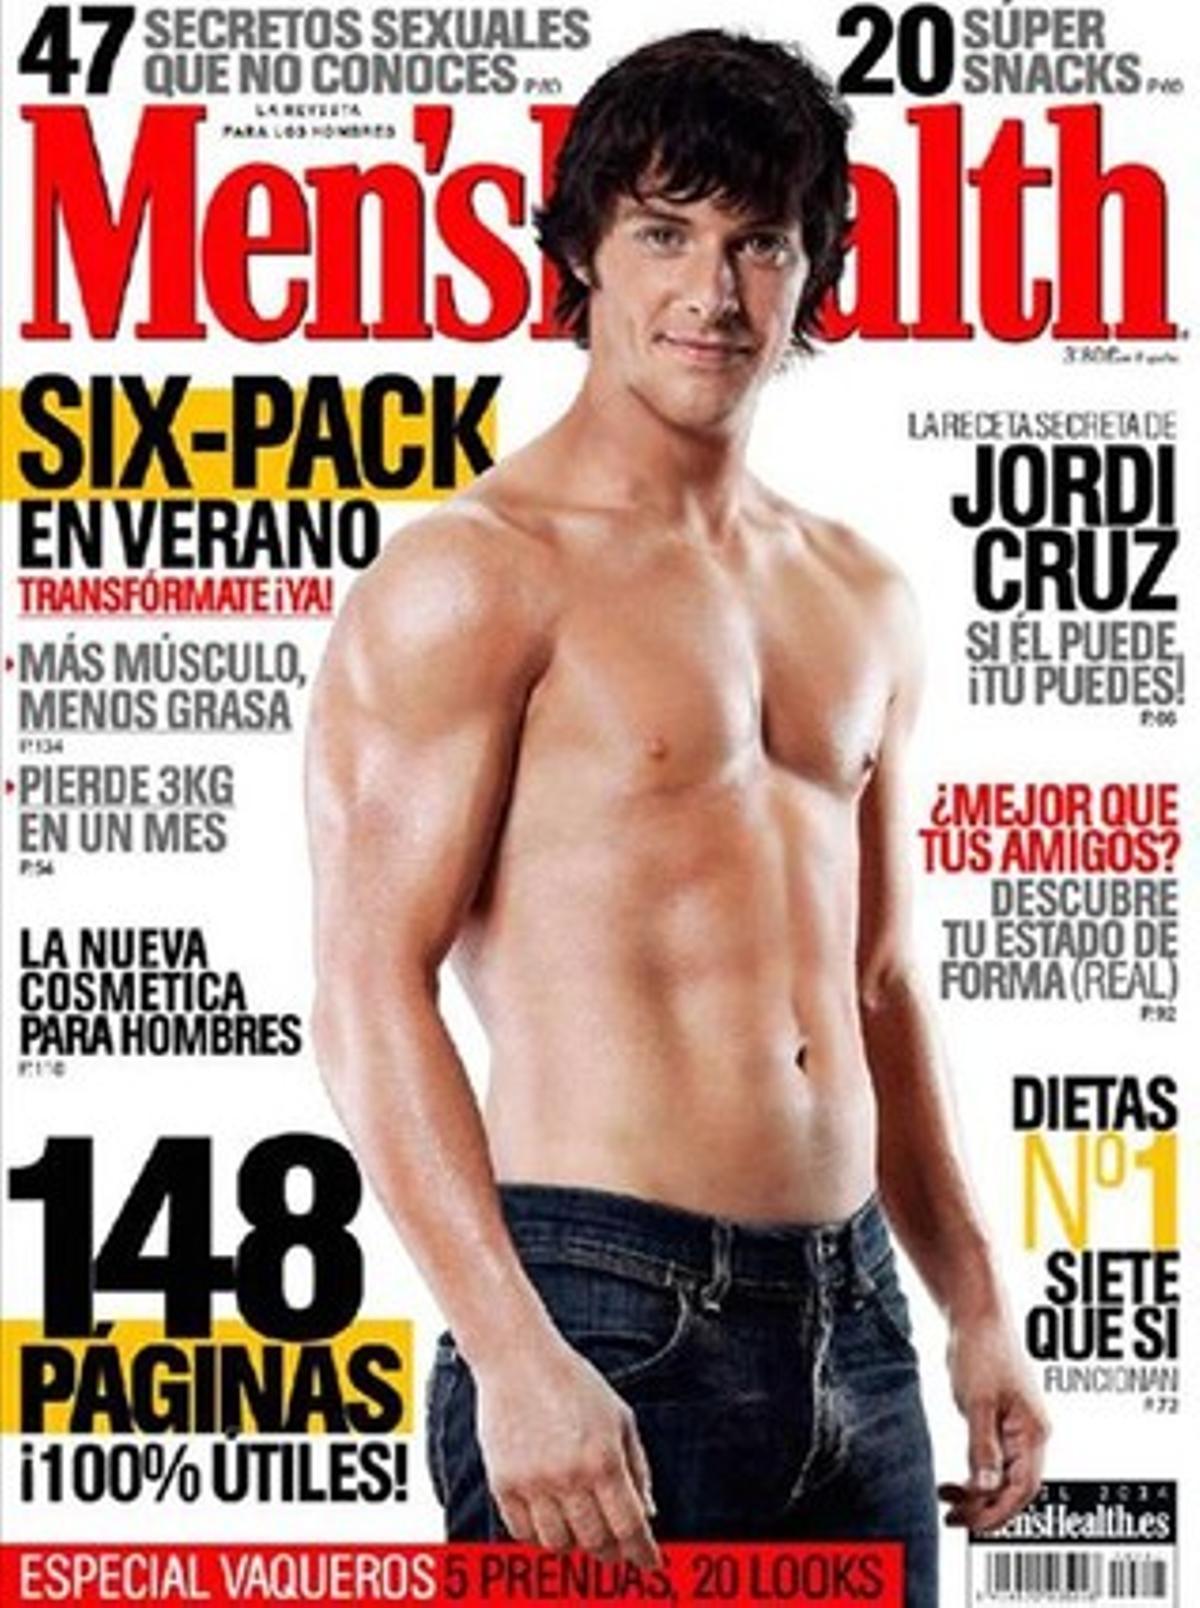 El chef manresano Jordi Cruz, portada de la revista 'Men's Health'.